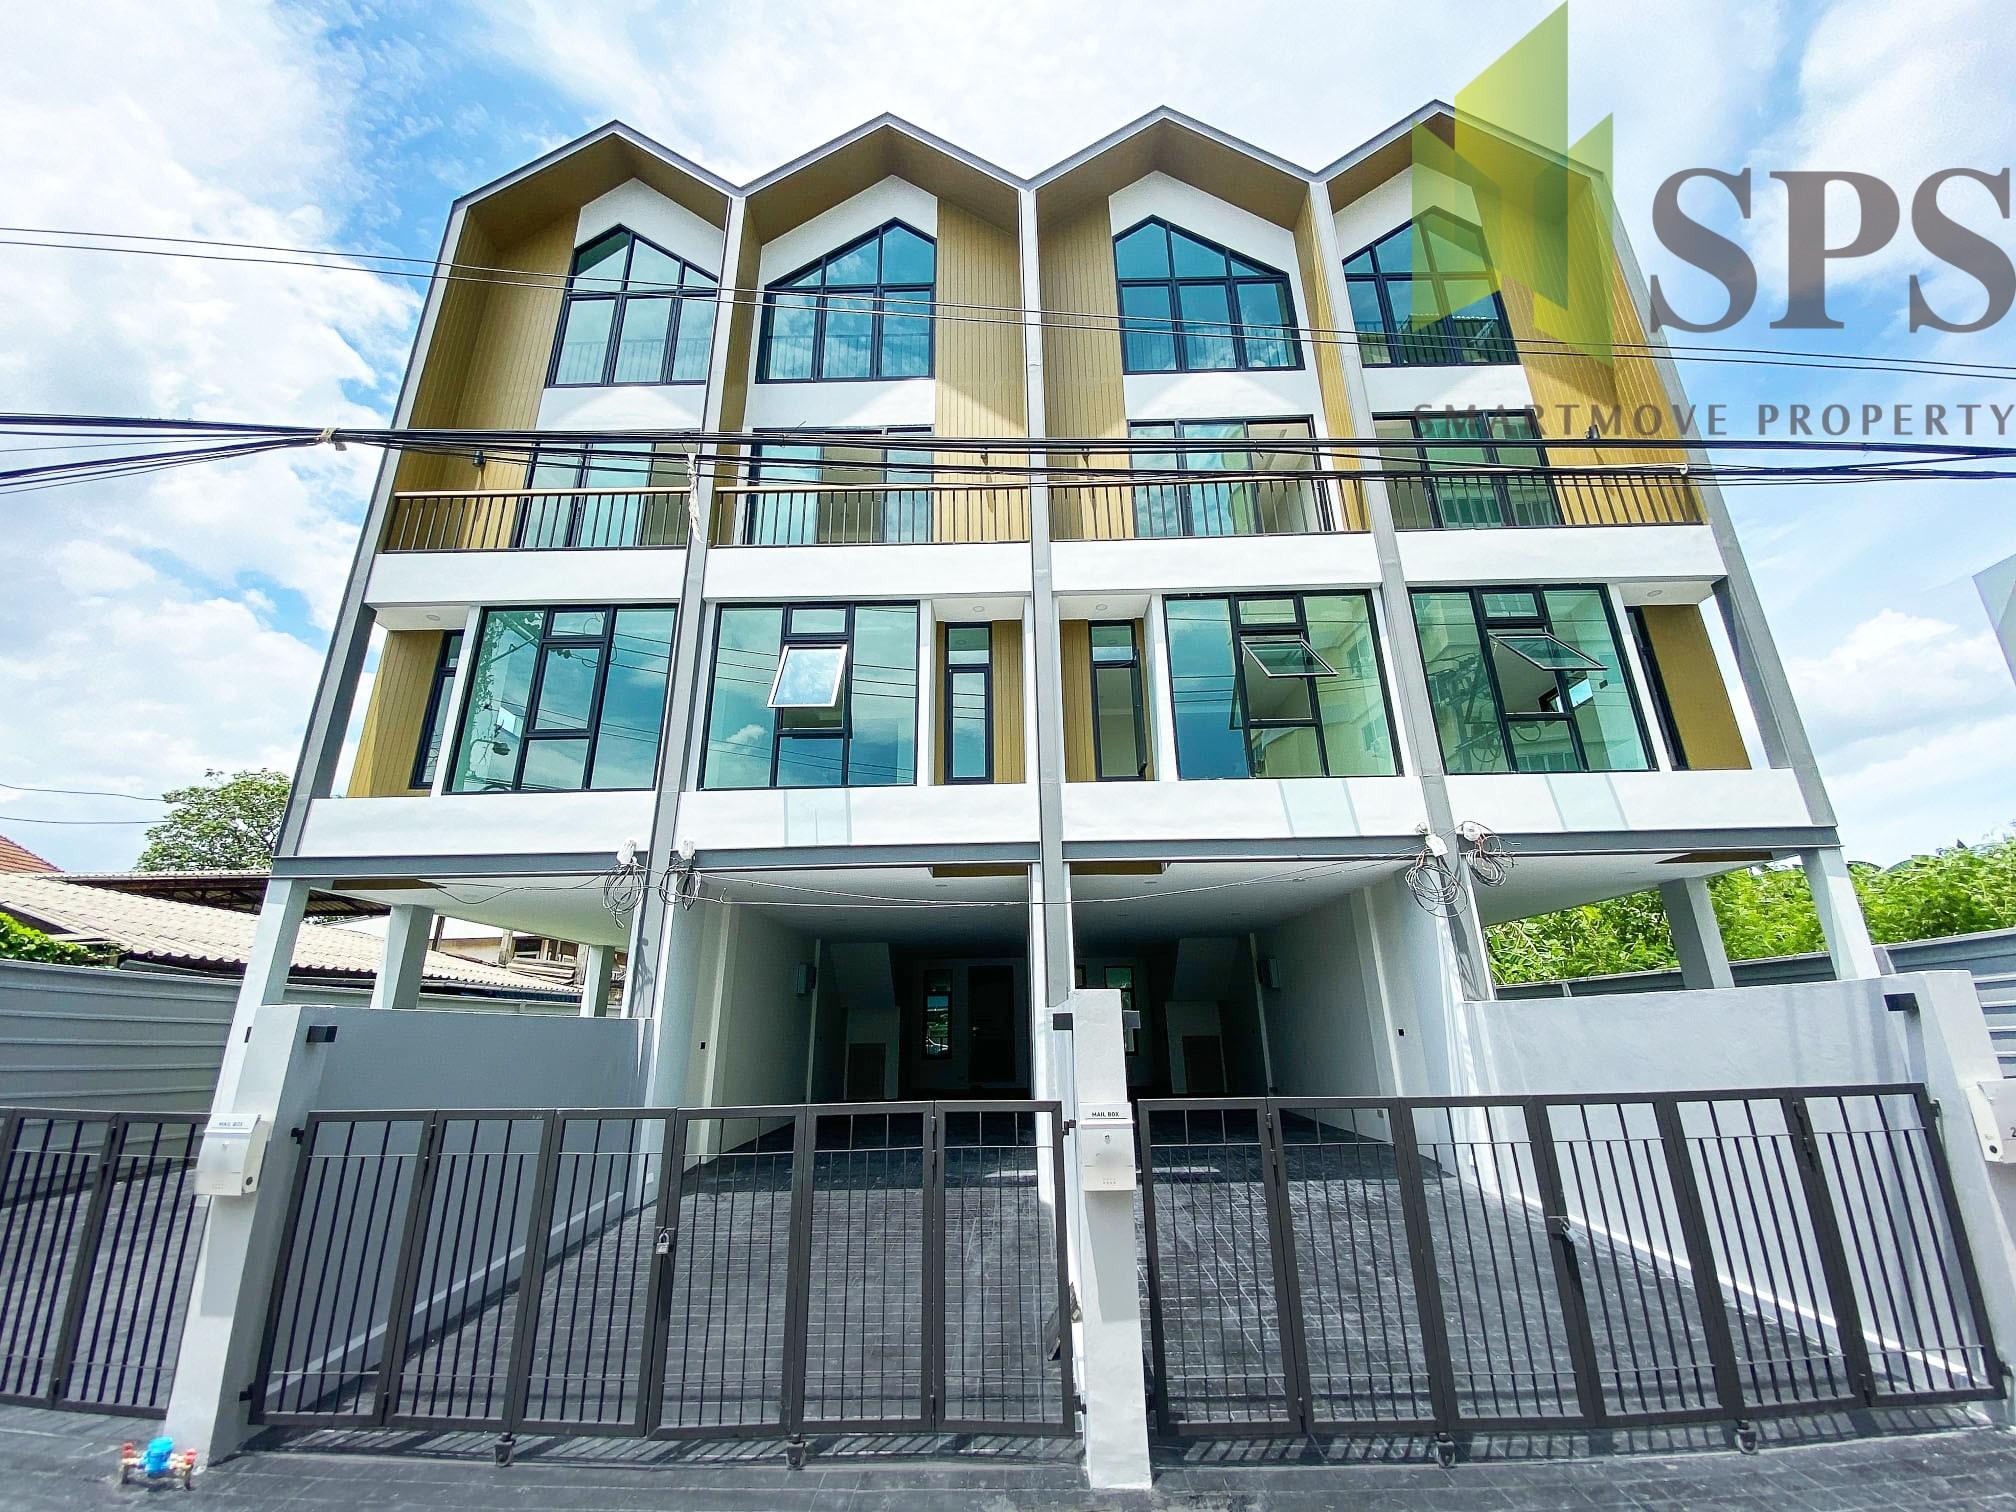 Home Office Sukhumvit 101/1 For Rent (SPS-GO490)